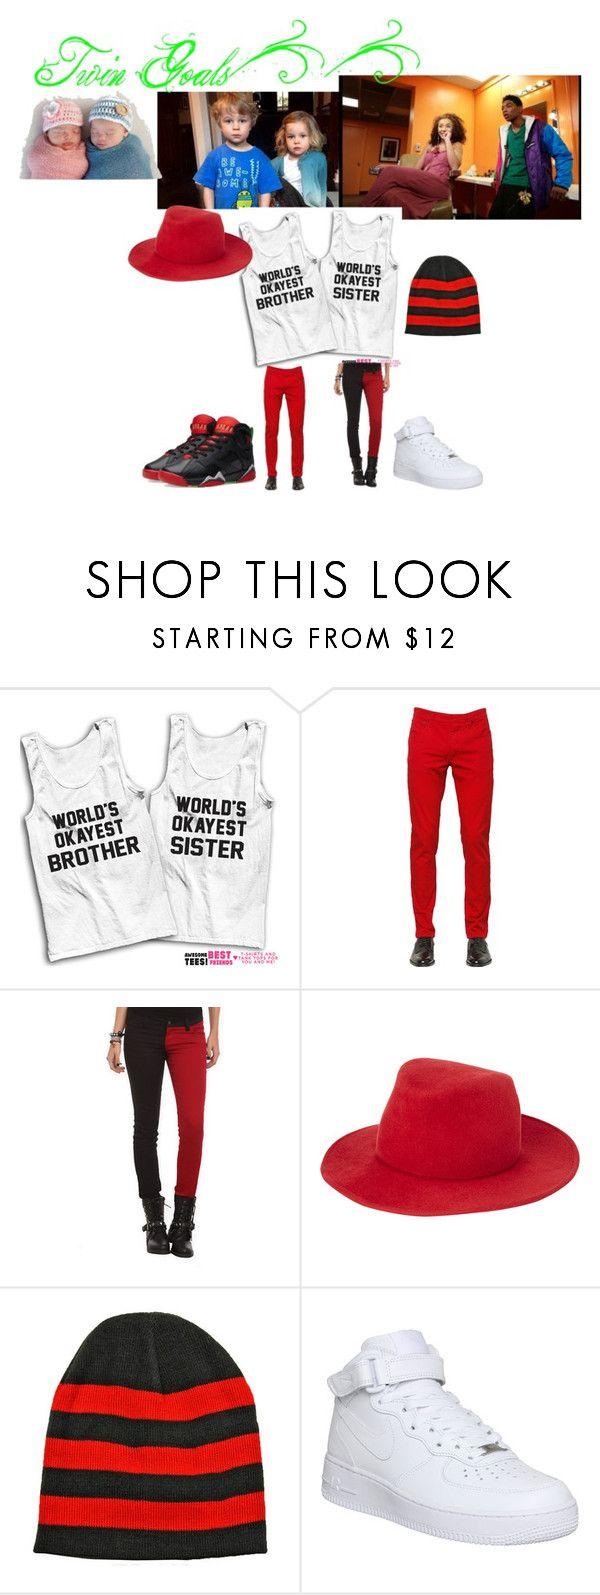 """Twin Goals👫❣"" by estheradu ❤ liked on Polyvore featuring Dolce&Gabbana, Tripp, rag & bone, NIKE and Jordan Brand"